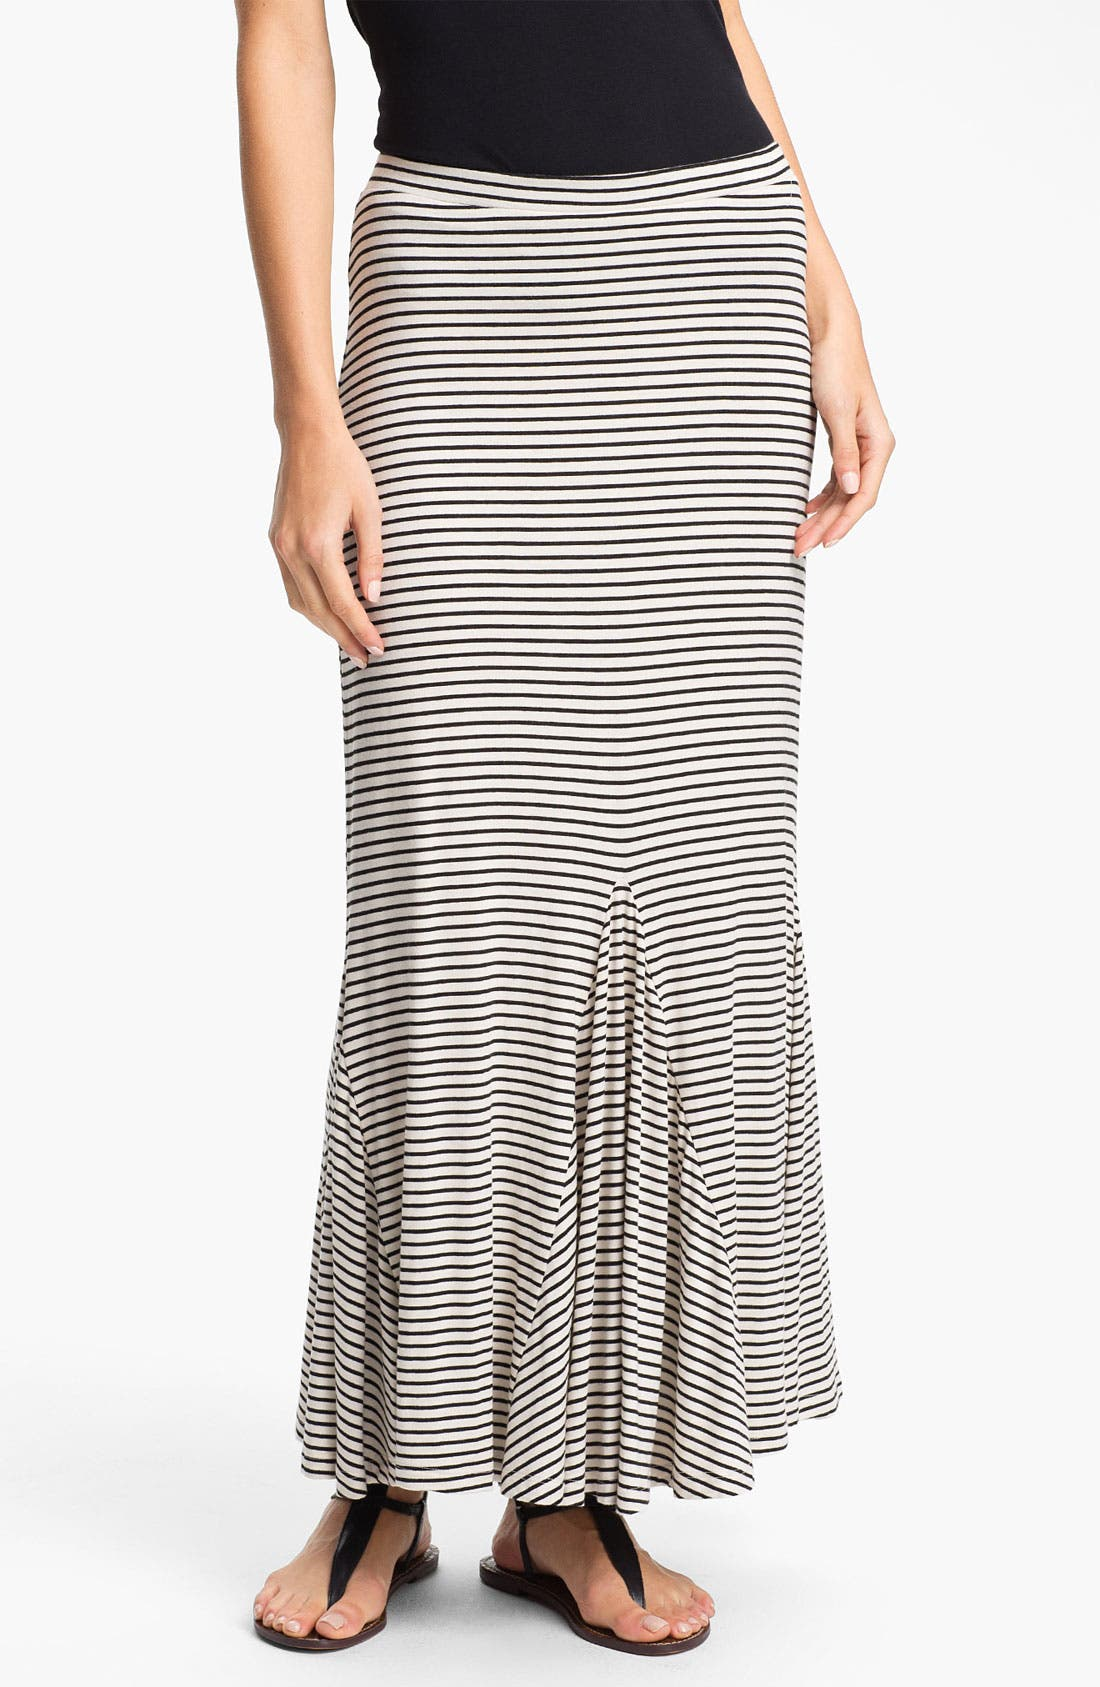 Alternate Image 1 Selected - Pleione Trumpet Hem Maxi Skirt (Regular & Petite)